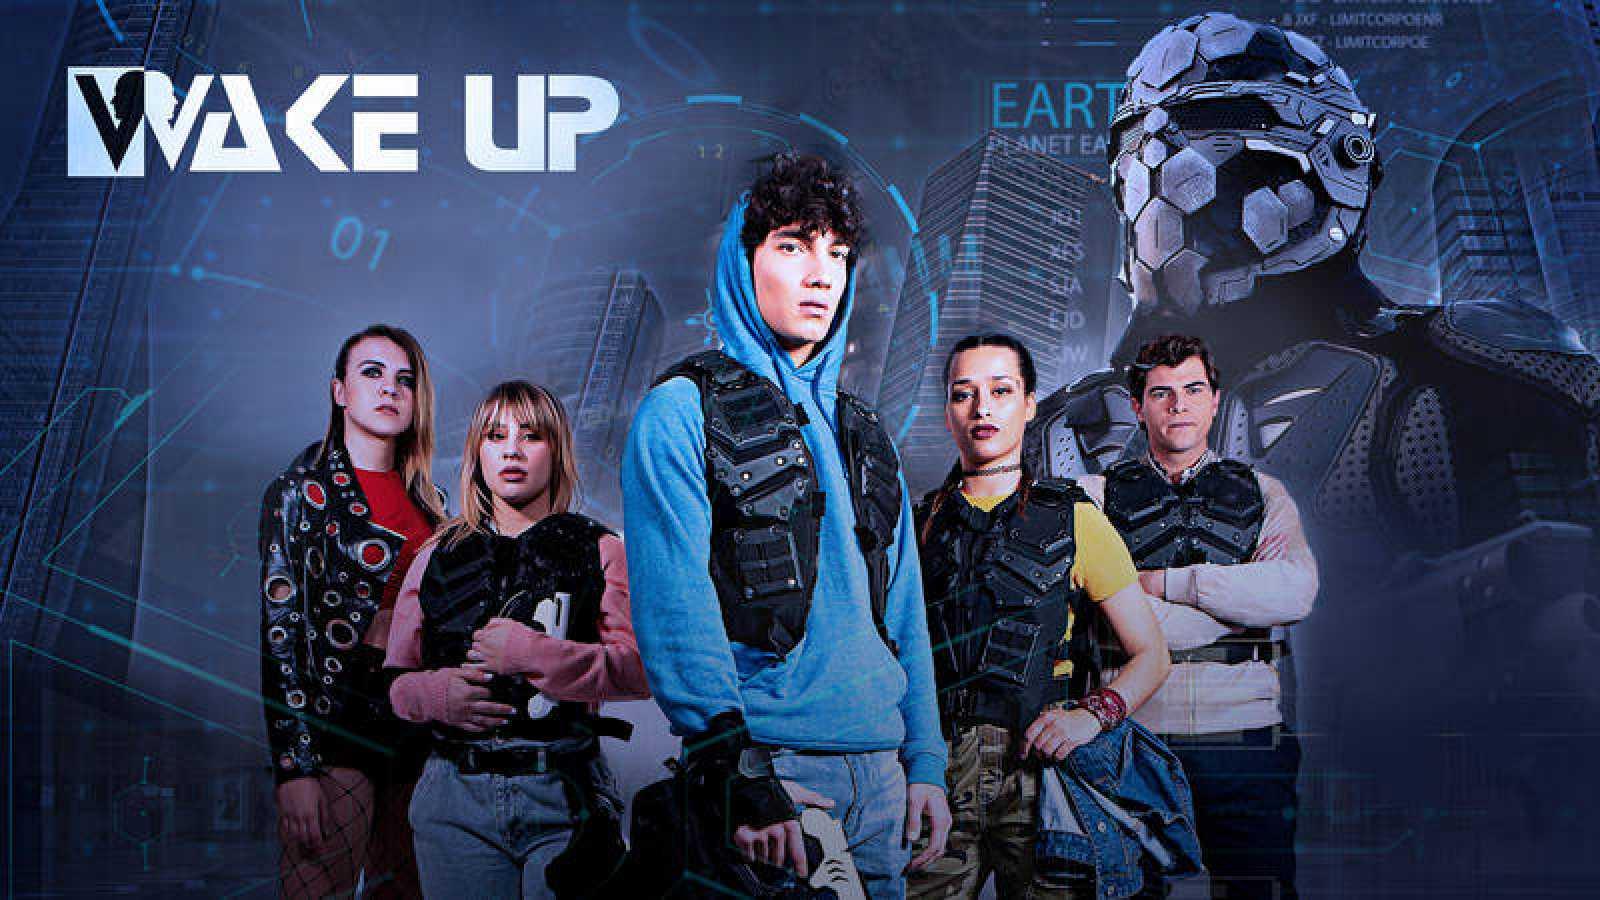 Jorge López, Lucía Gil, Diego Domínguez, Andrea Guasch y Chanel Terrero protagonizan 'Wake Up'